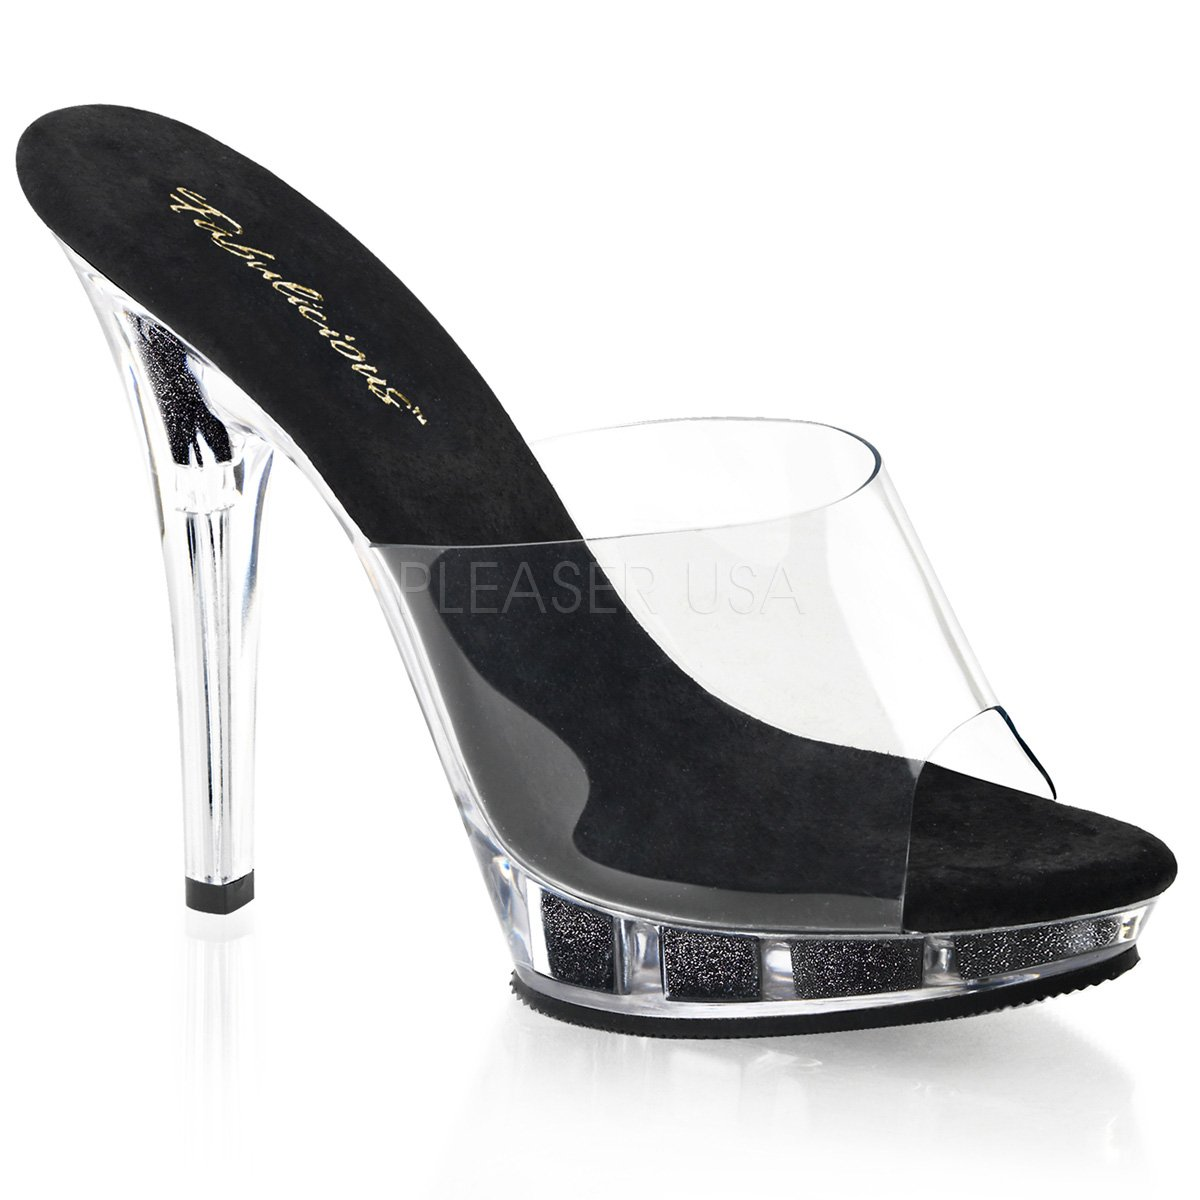 Fabulicious Women's Lip 101 Platform Sandal B00DGII1UY 5 B(M) US|Clear / Black Glitter